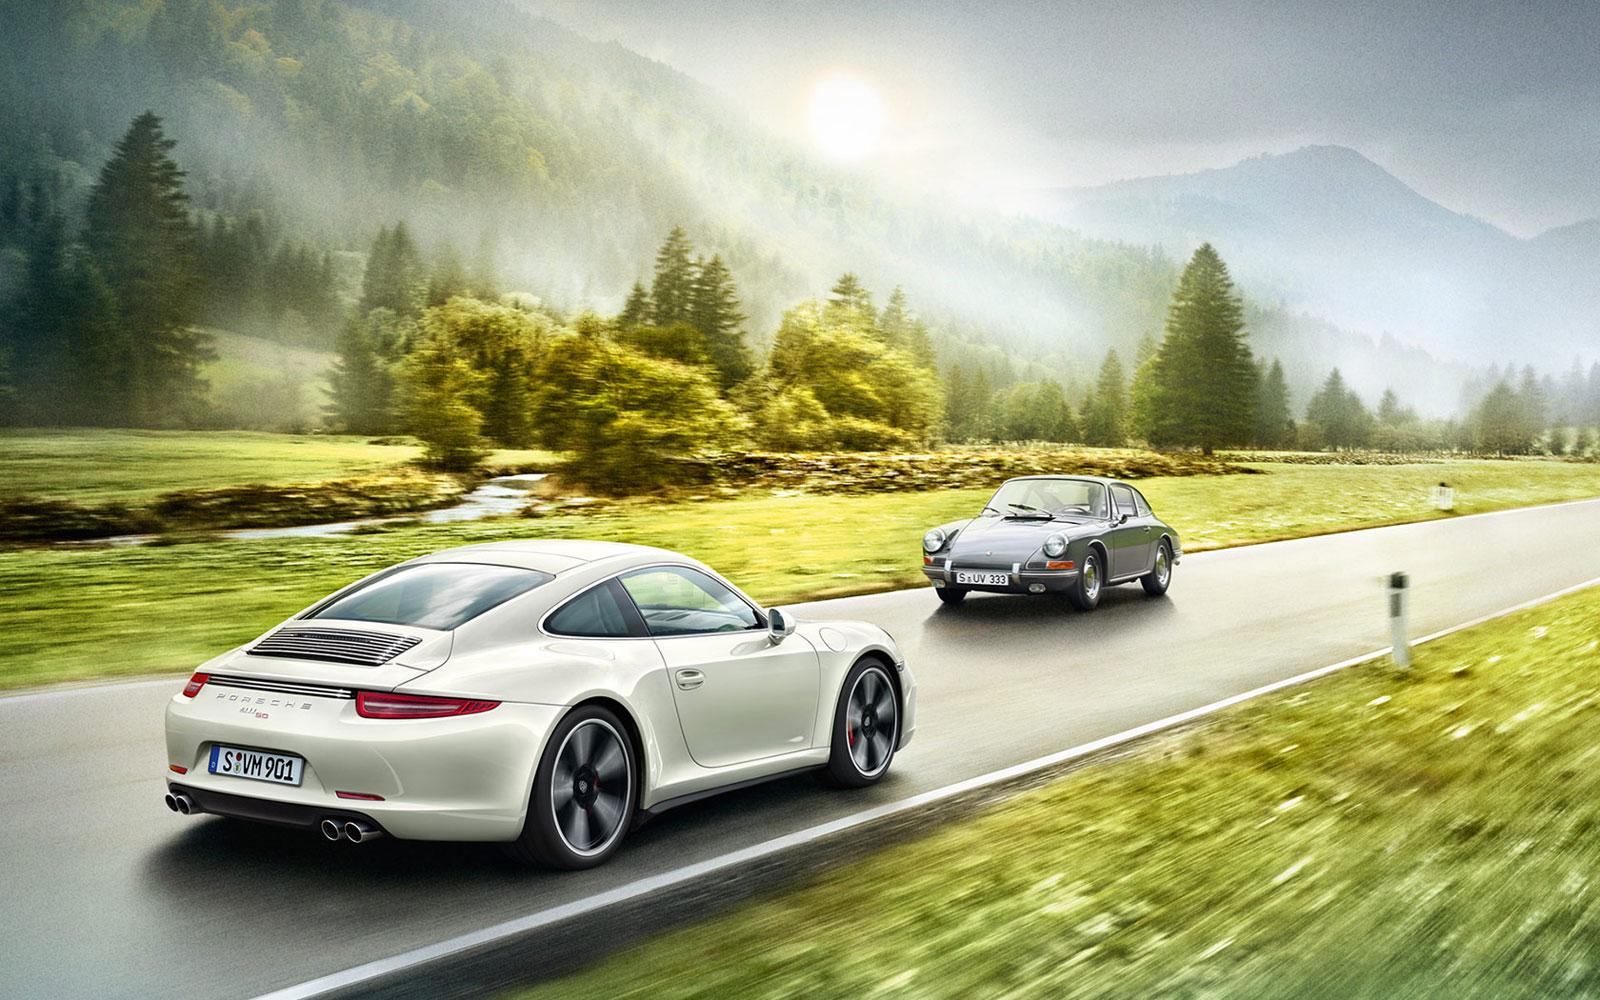 Porsche 911 50th Anniversary Edition Revealed: Video